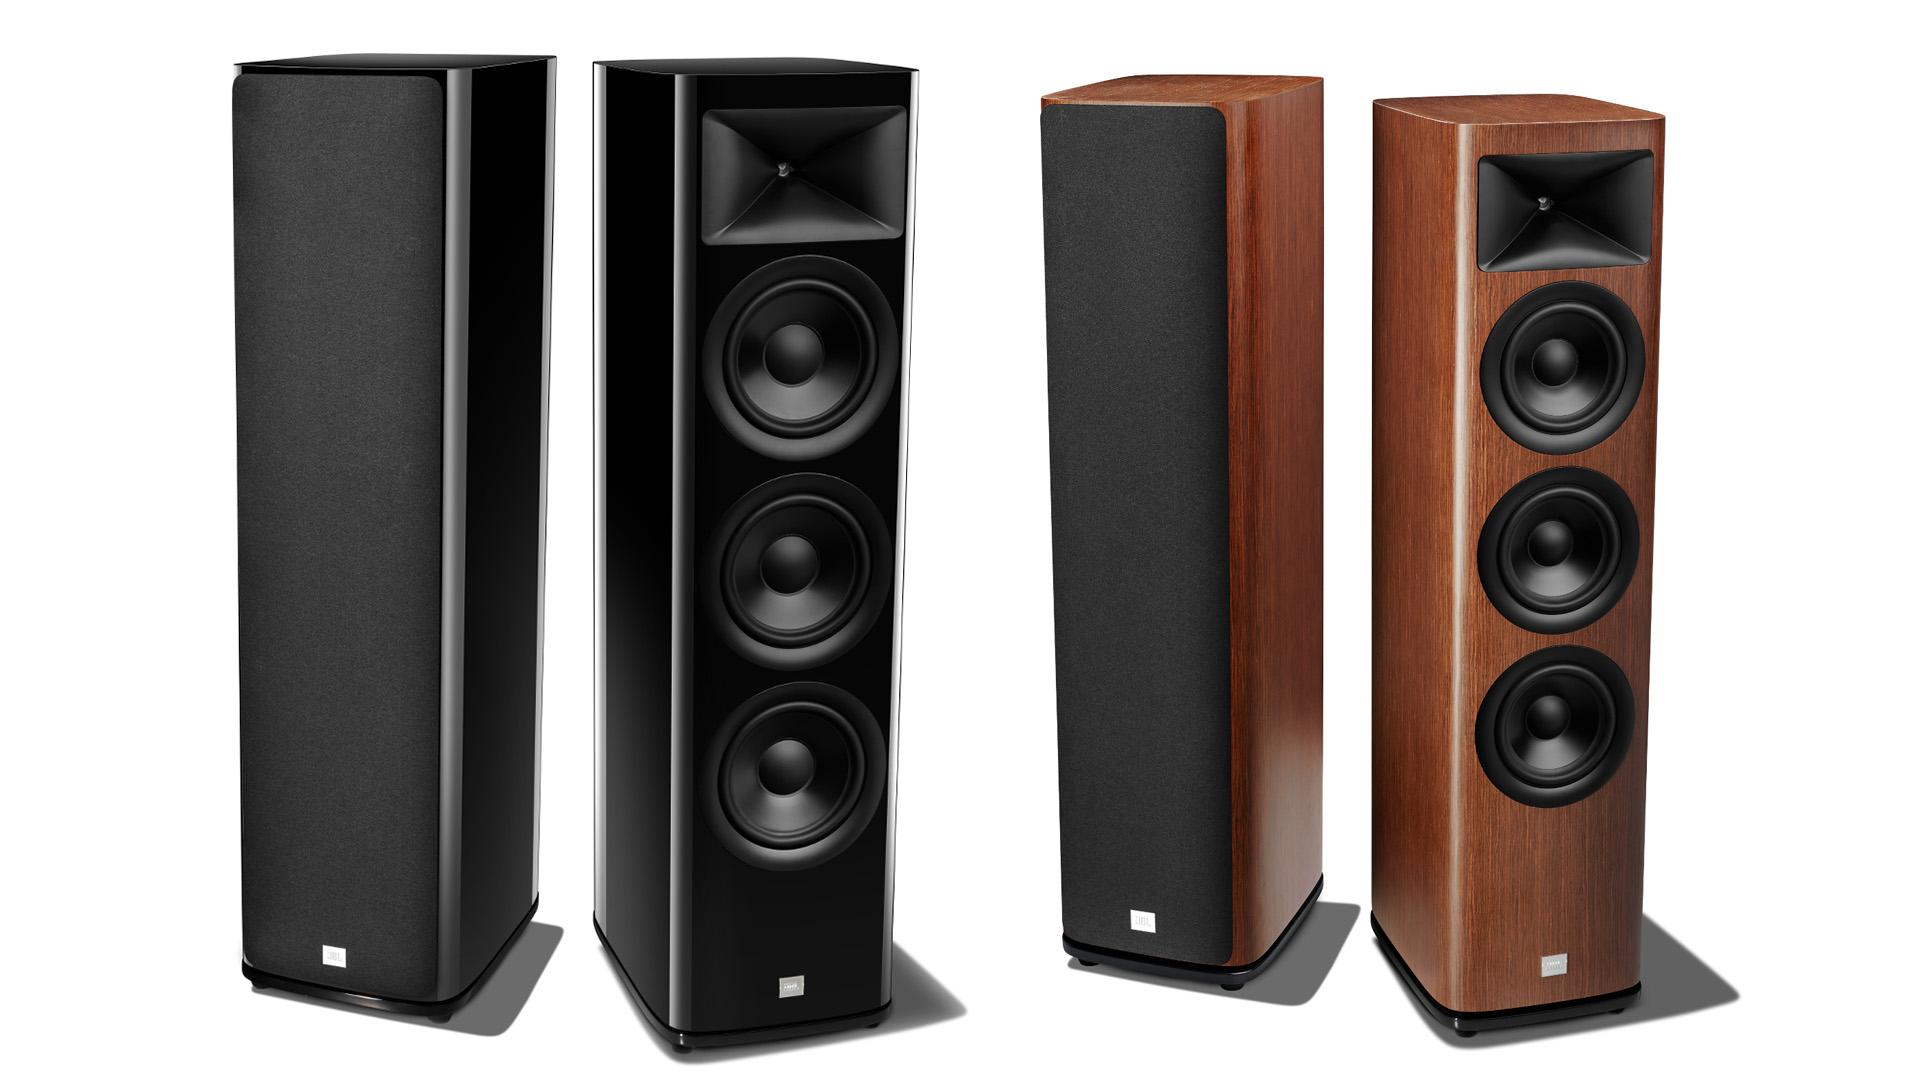 JBL представляет новую серию акустики HDI